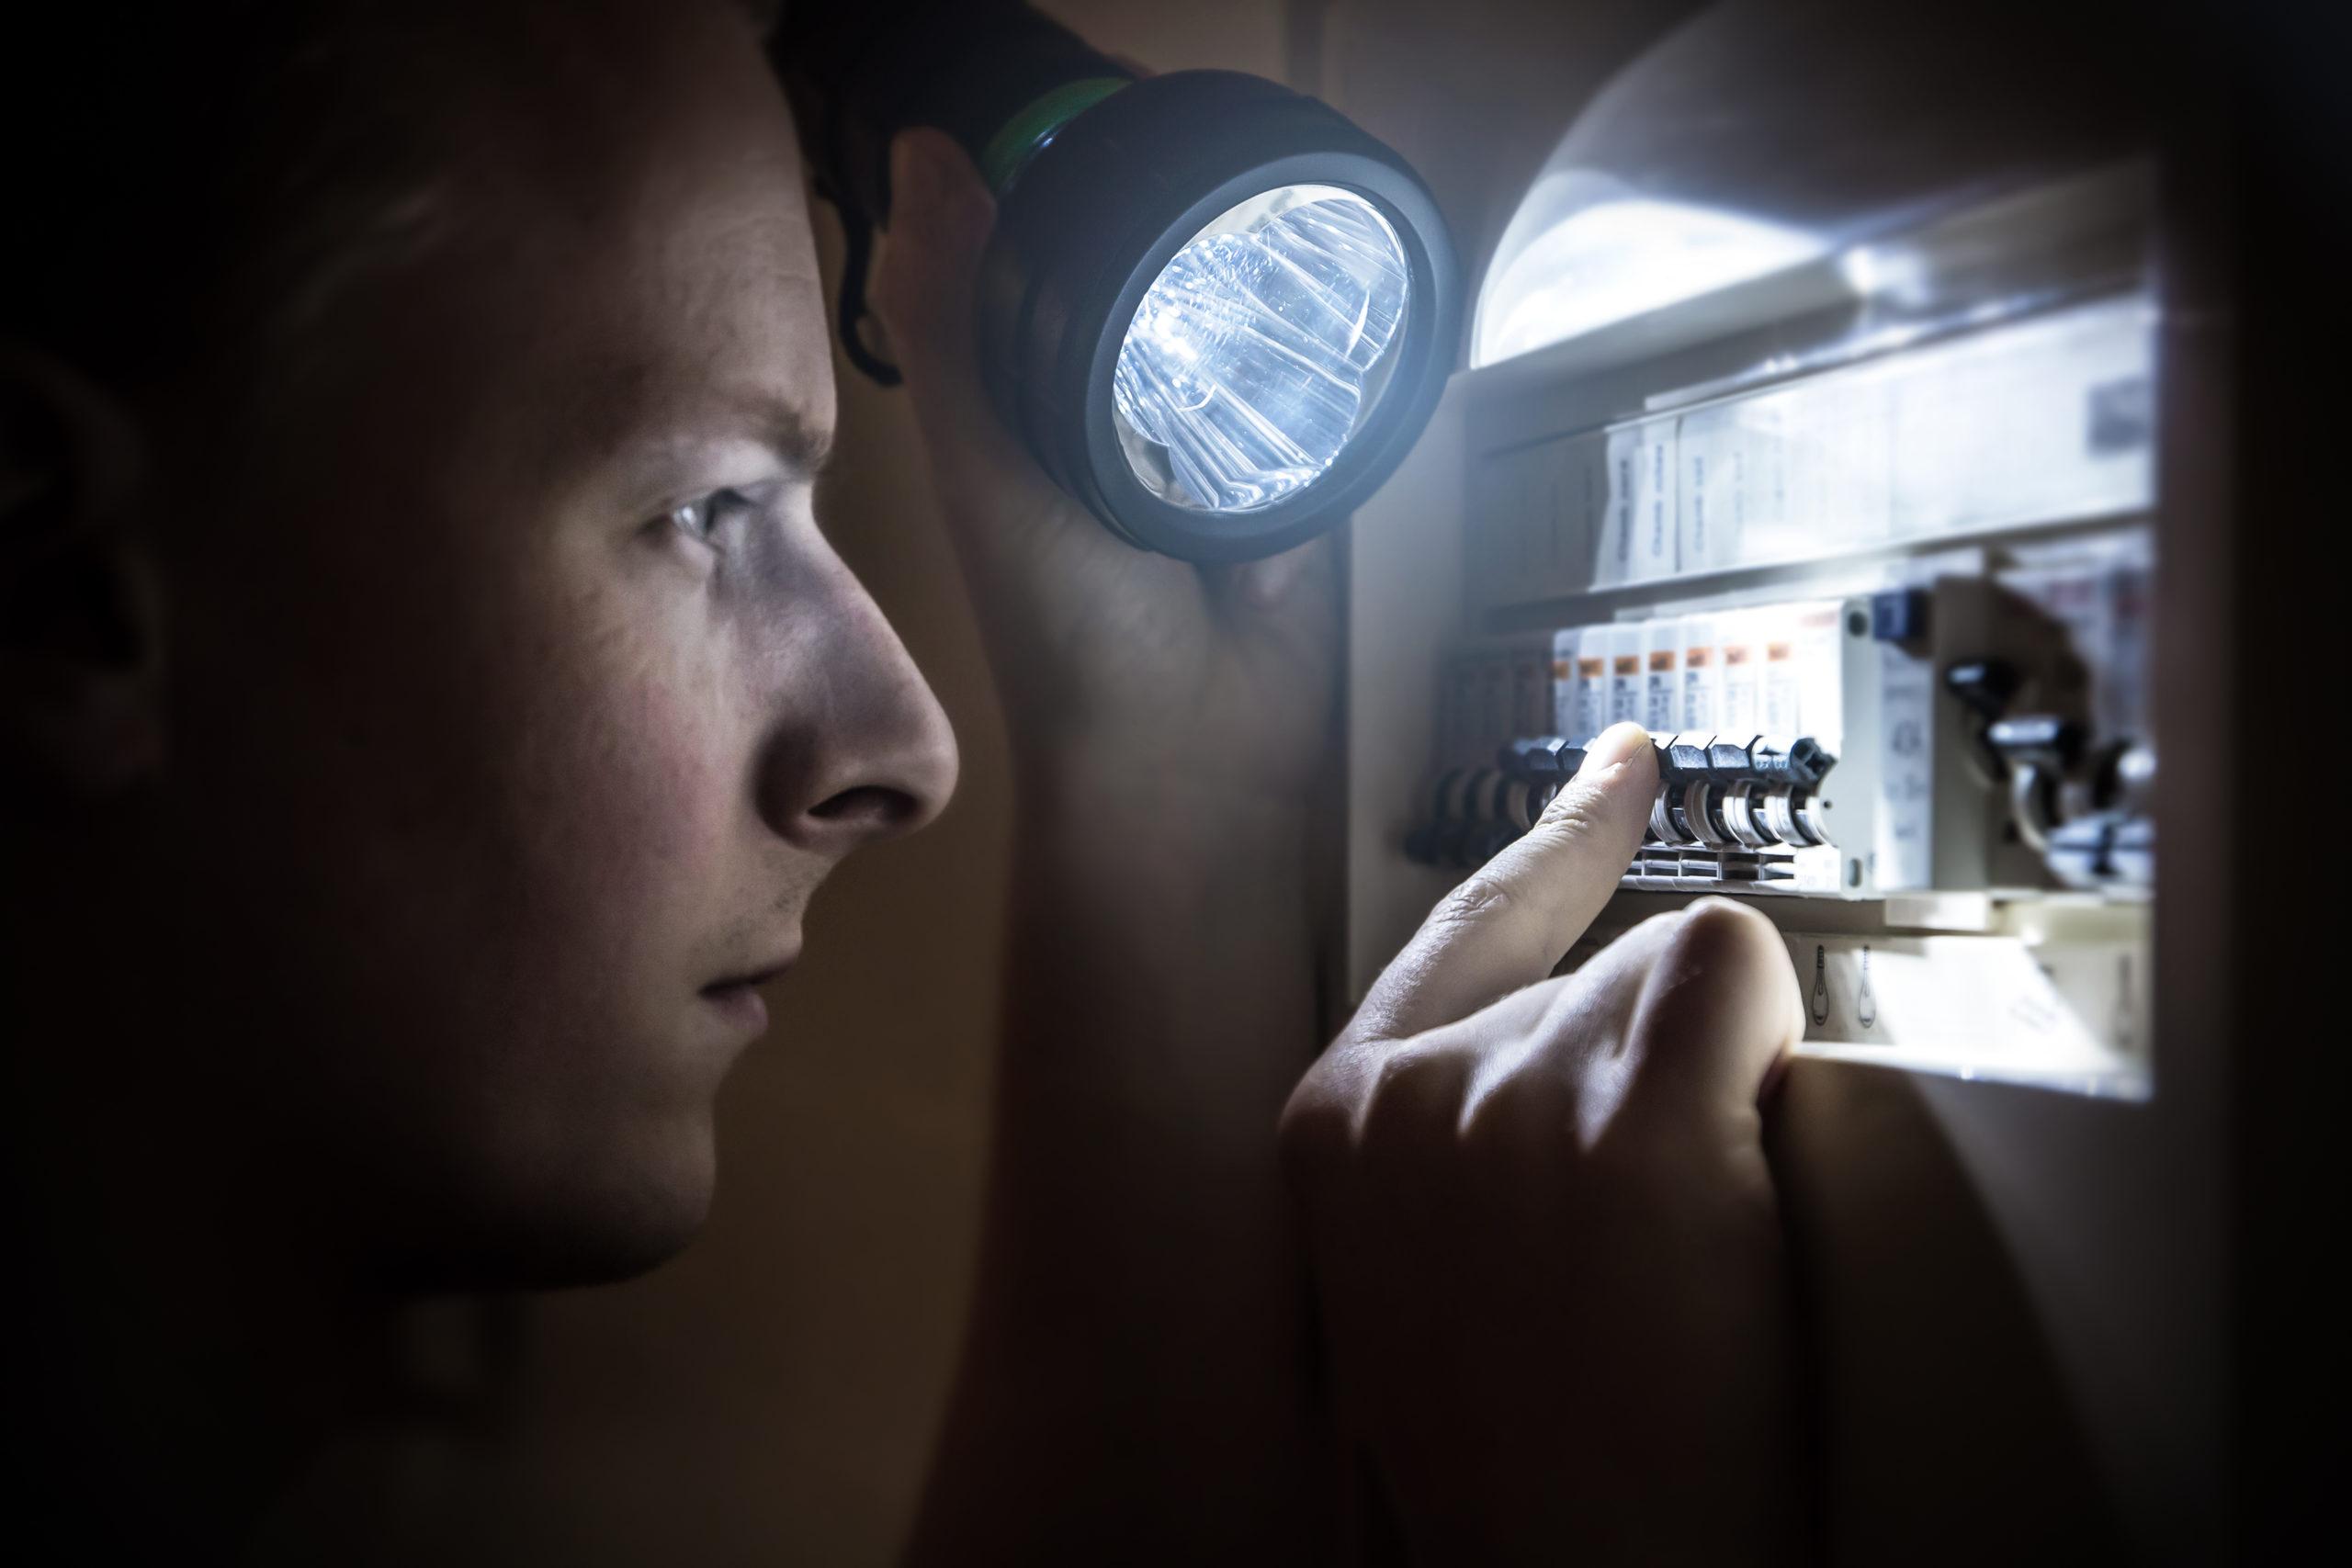 a man holding the Energizer flashlight restoring power on circuit breaker